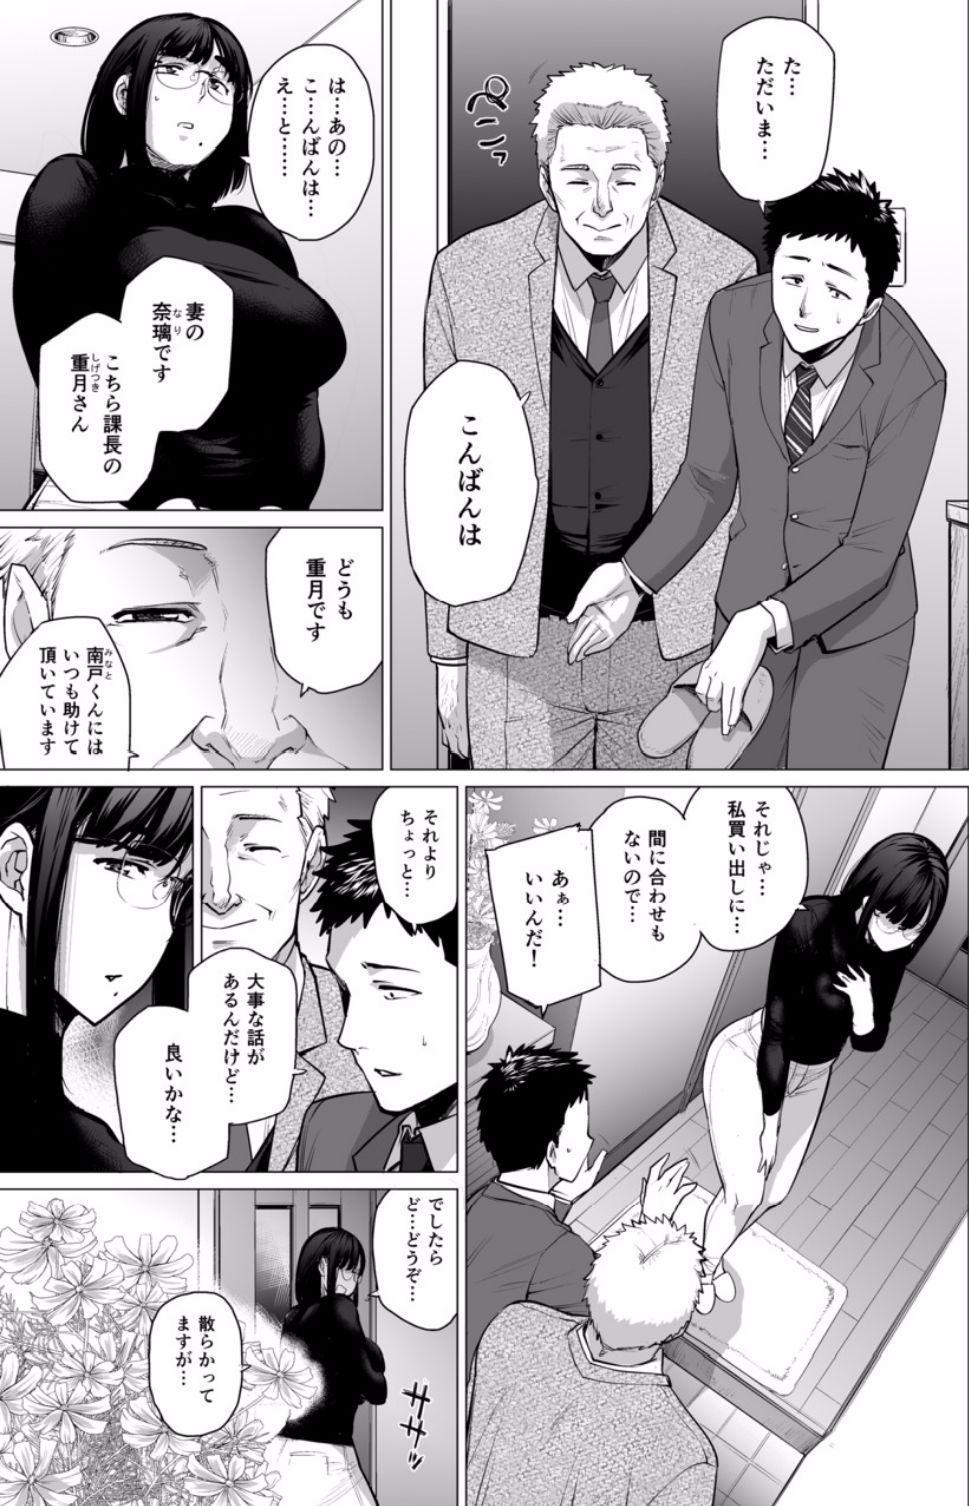 [Etuzan Jakusui] Somerare - Mizu Yari 1-3 4